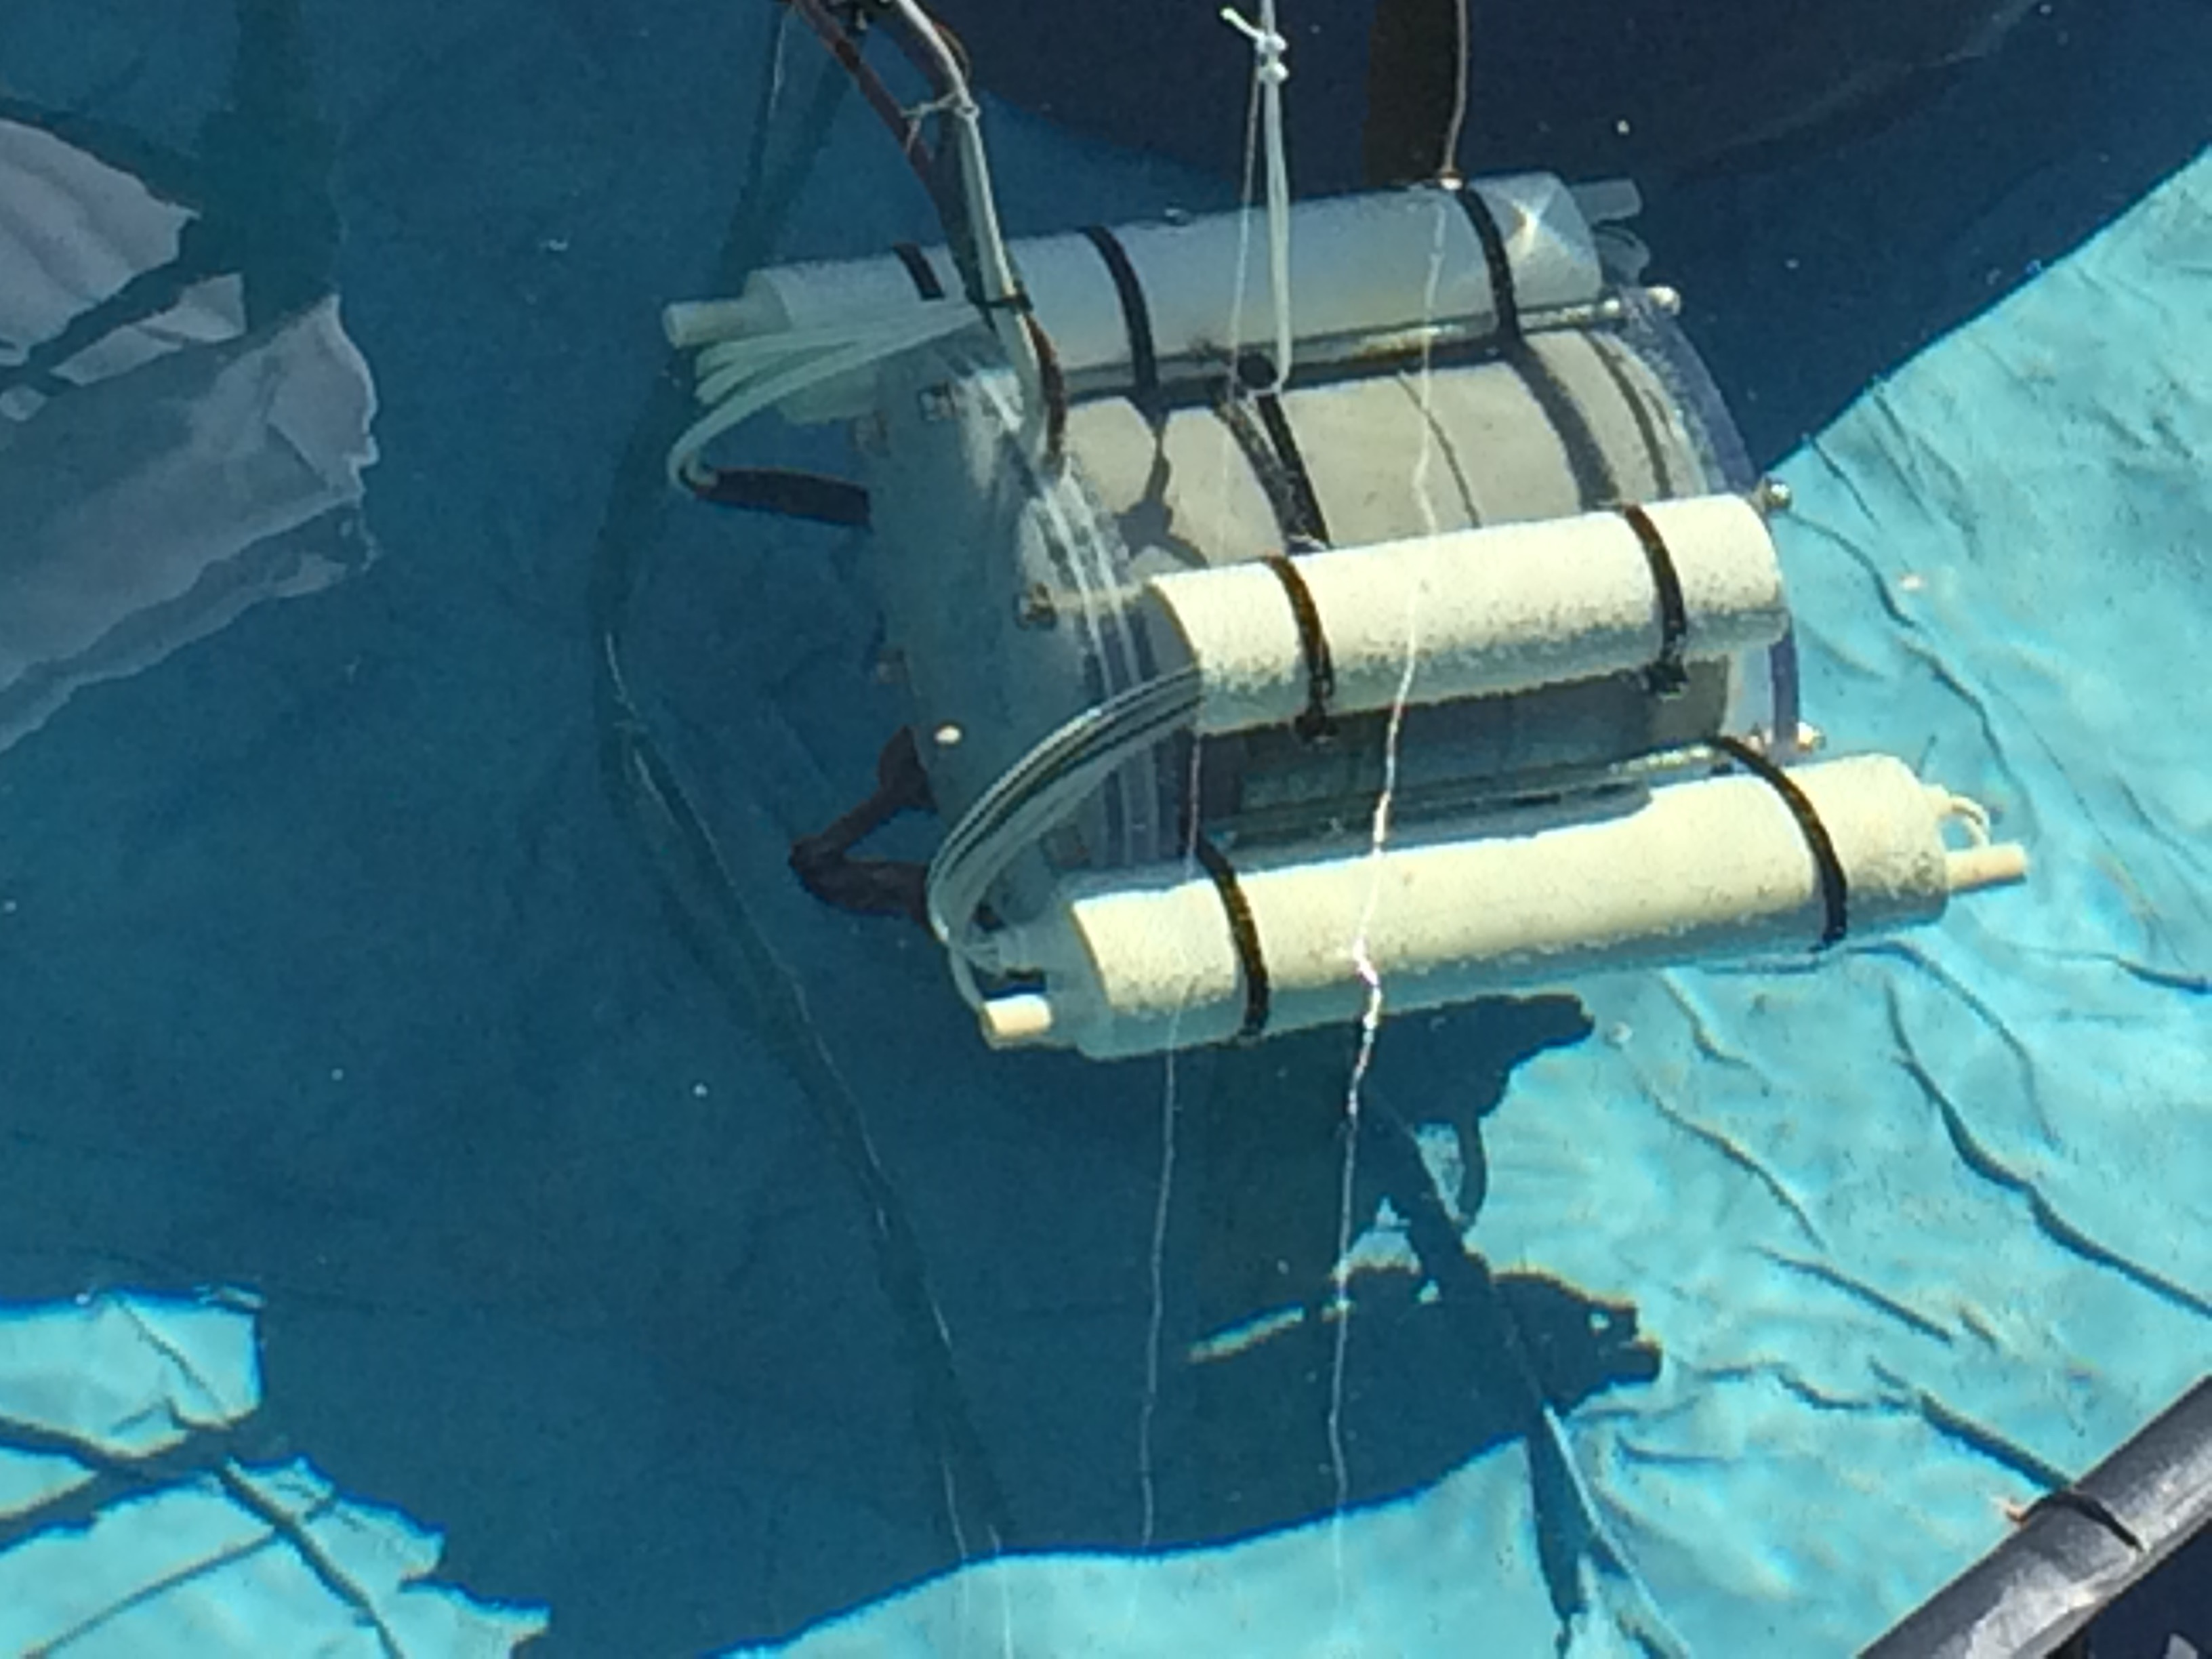 A Raspberry Pi powered underwater ROV at Maker Faire Trondheim